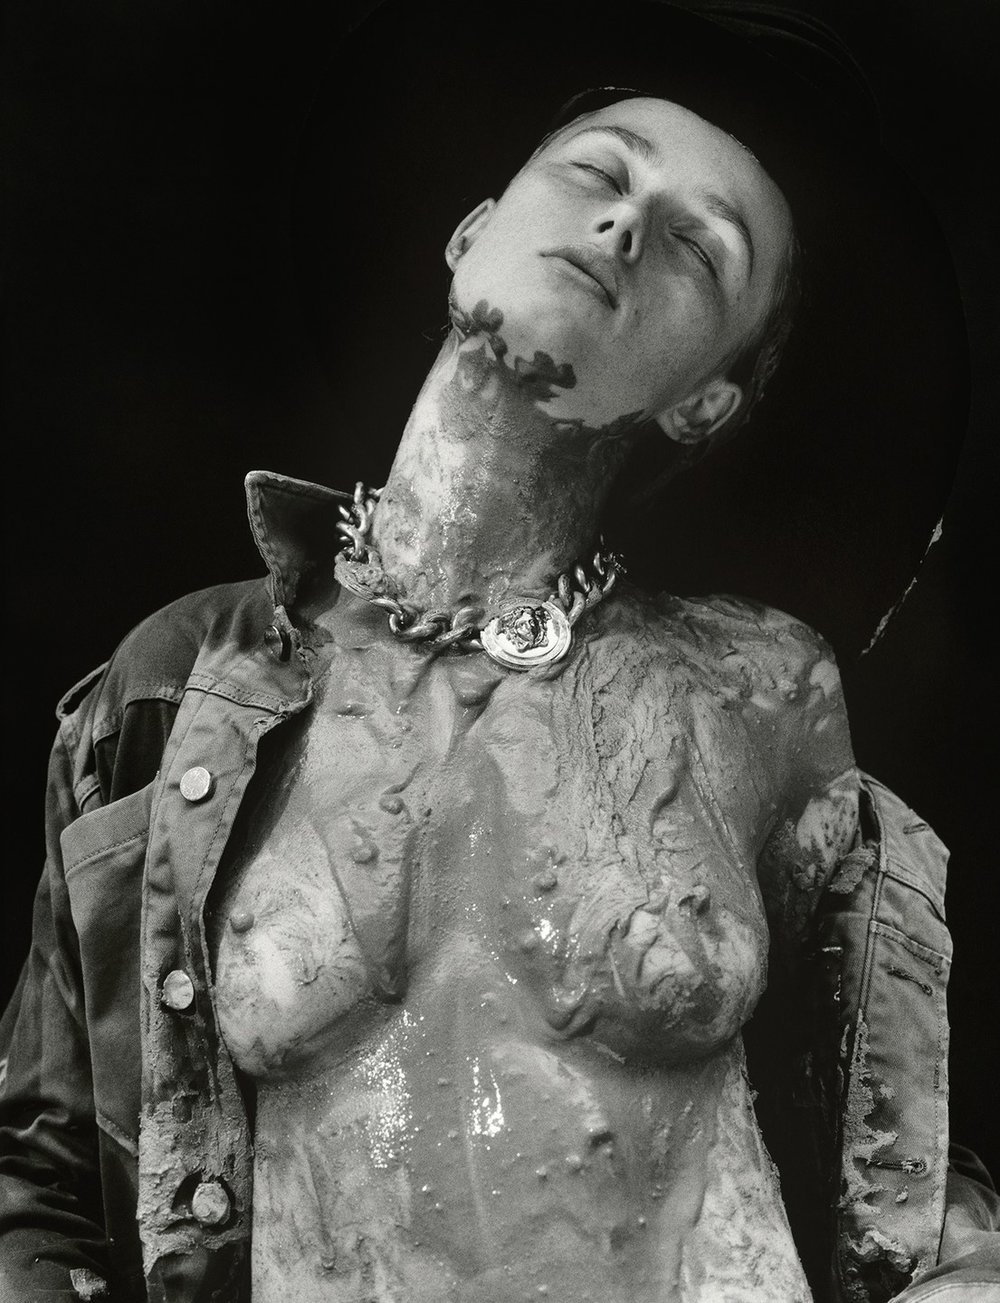 Rianne_van_Rompaey-Harley_Weir-Love_Magazine-01-itr2010.jpg